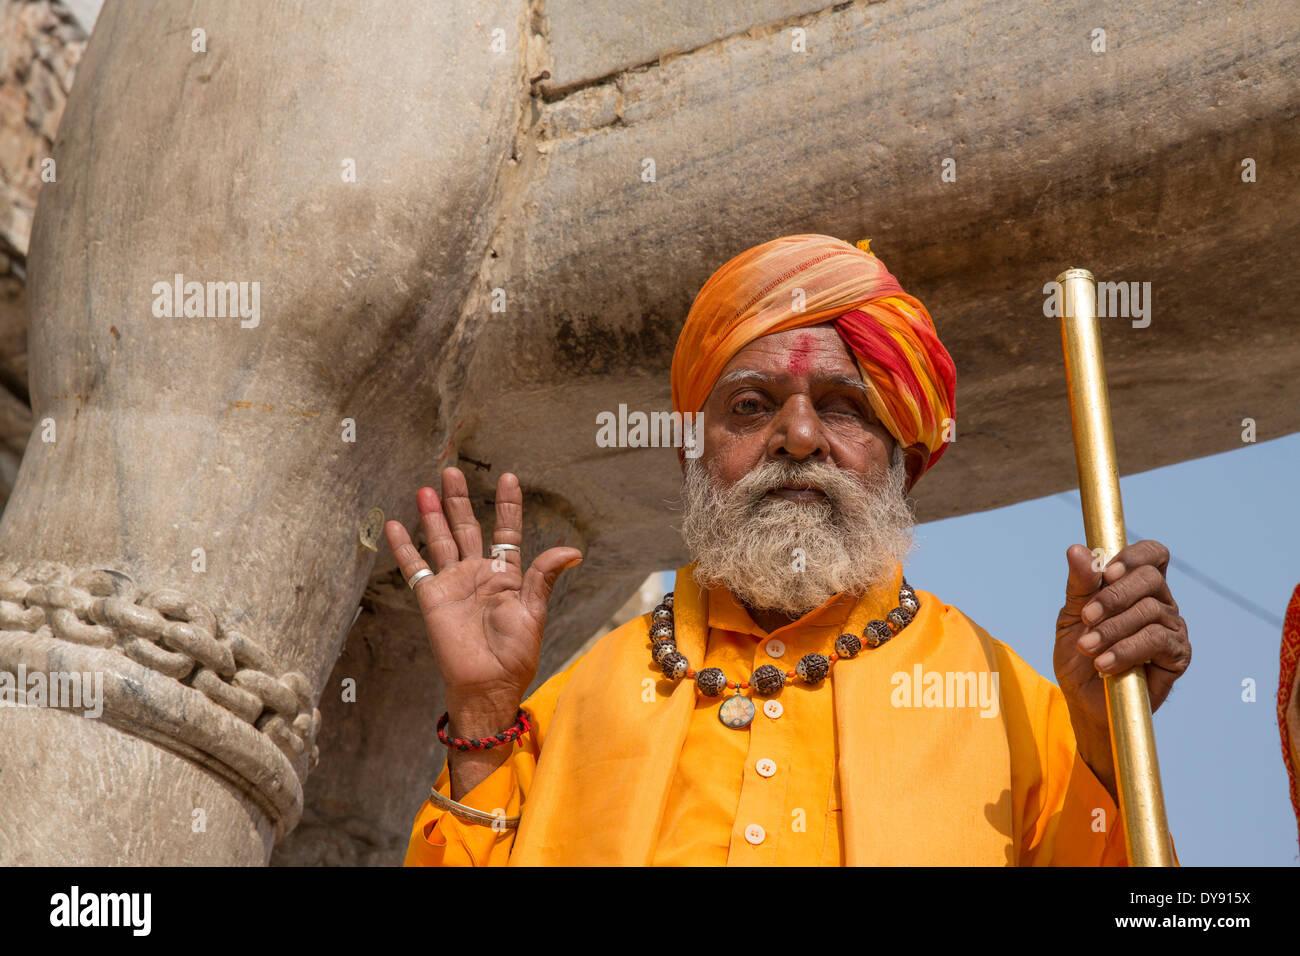 Man, Hindu, Jagdish, temple, Udaipur, Rajasthan, Asia, church, religion, India, - Stock Image